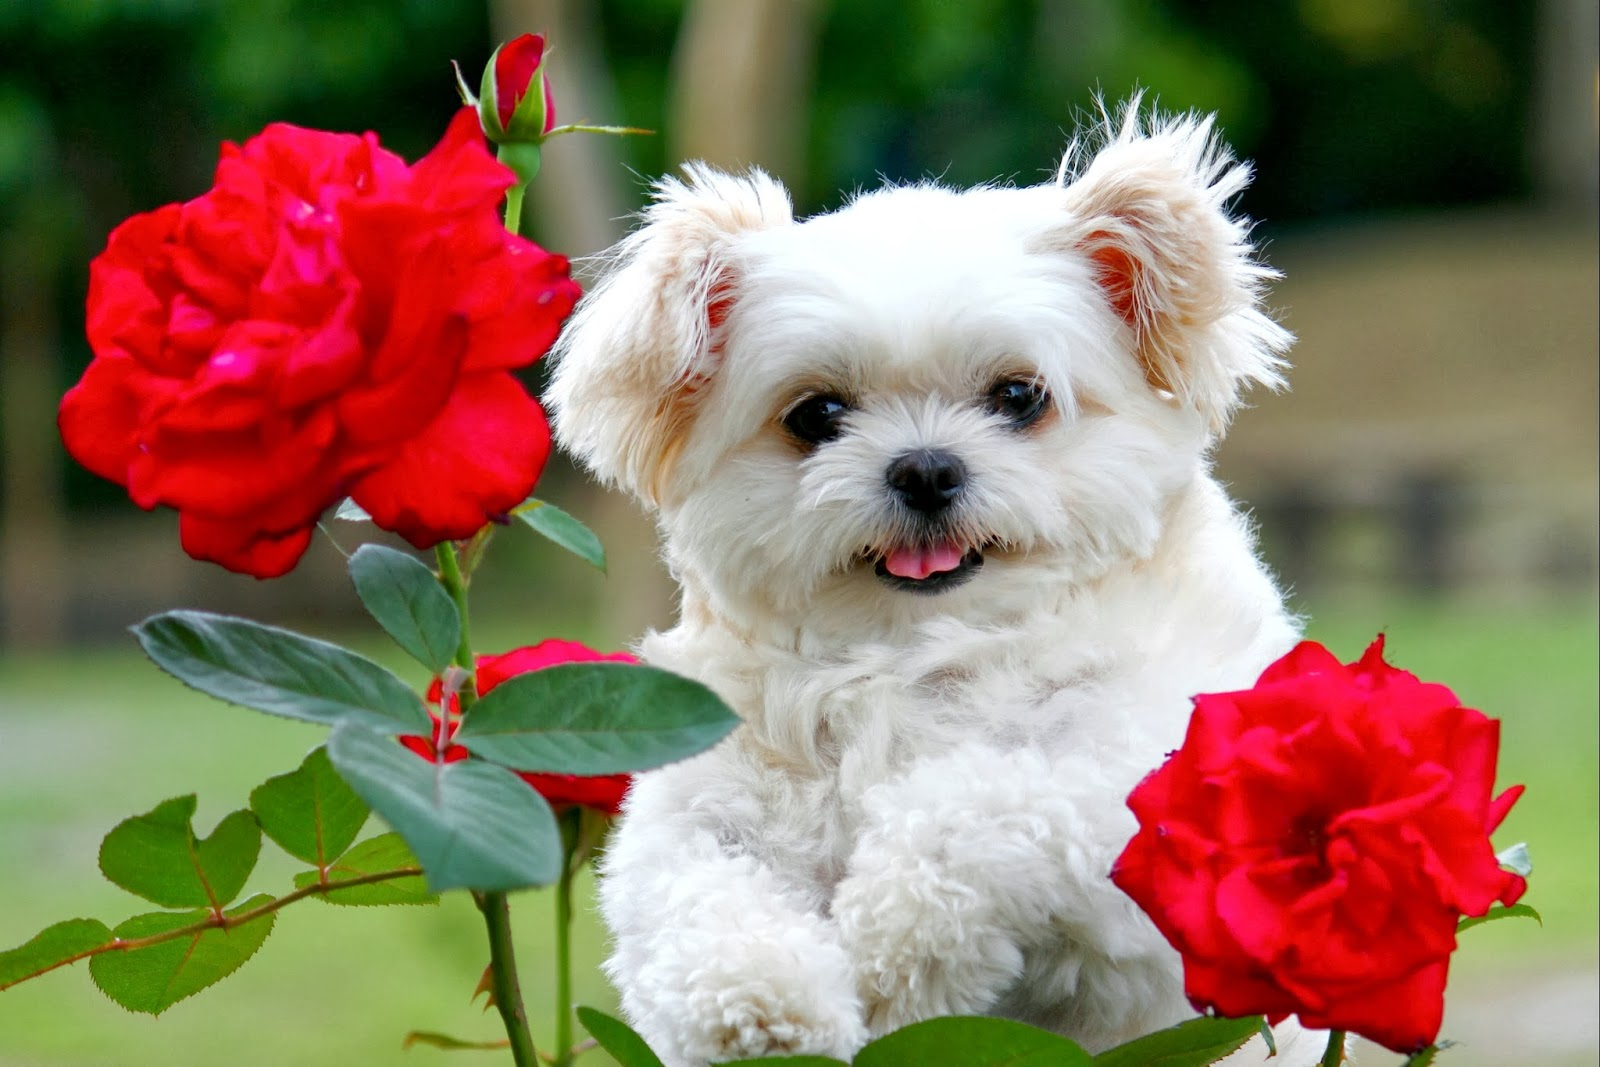 Beautiful cute puppies wallpapers free hd desktop for Immagini divertenti desktop